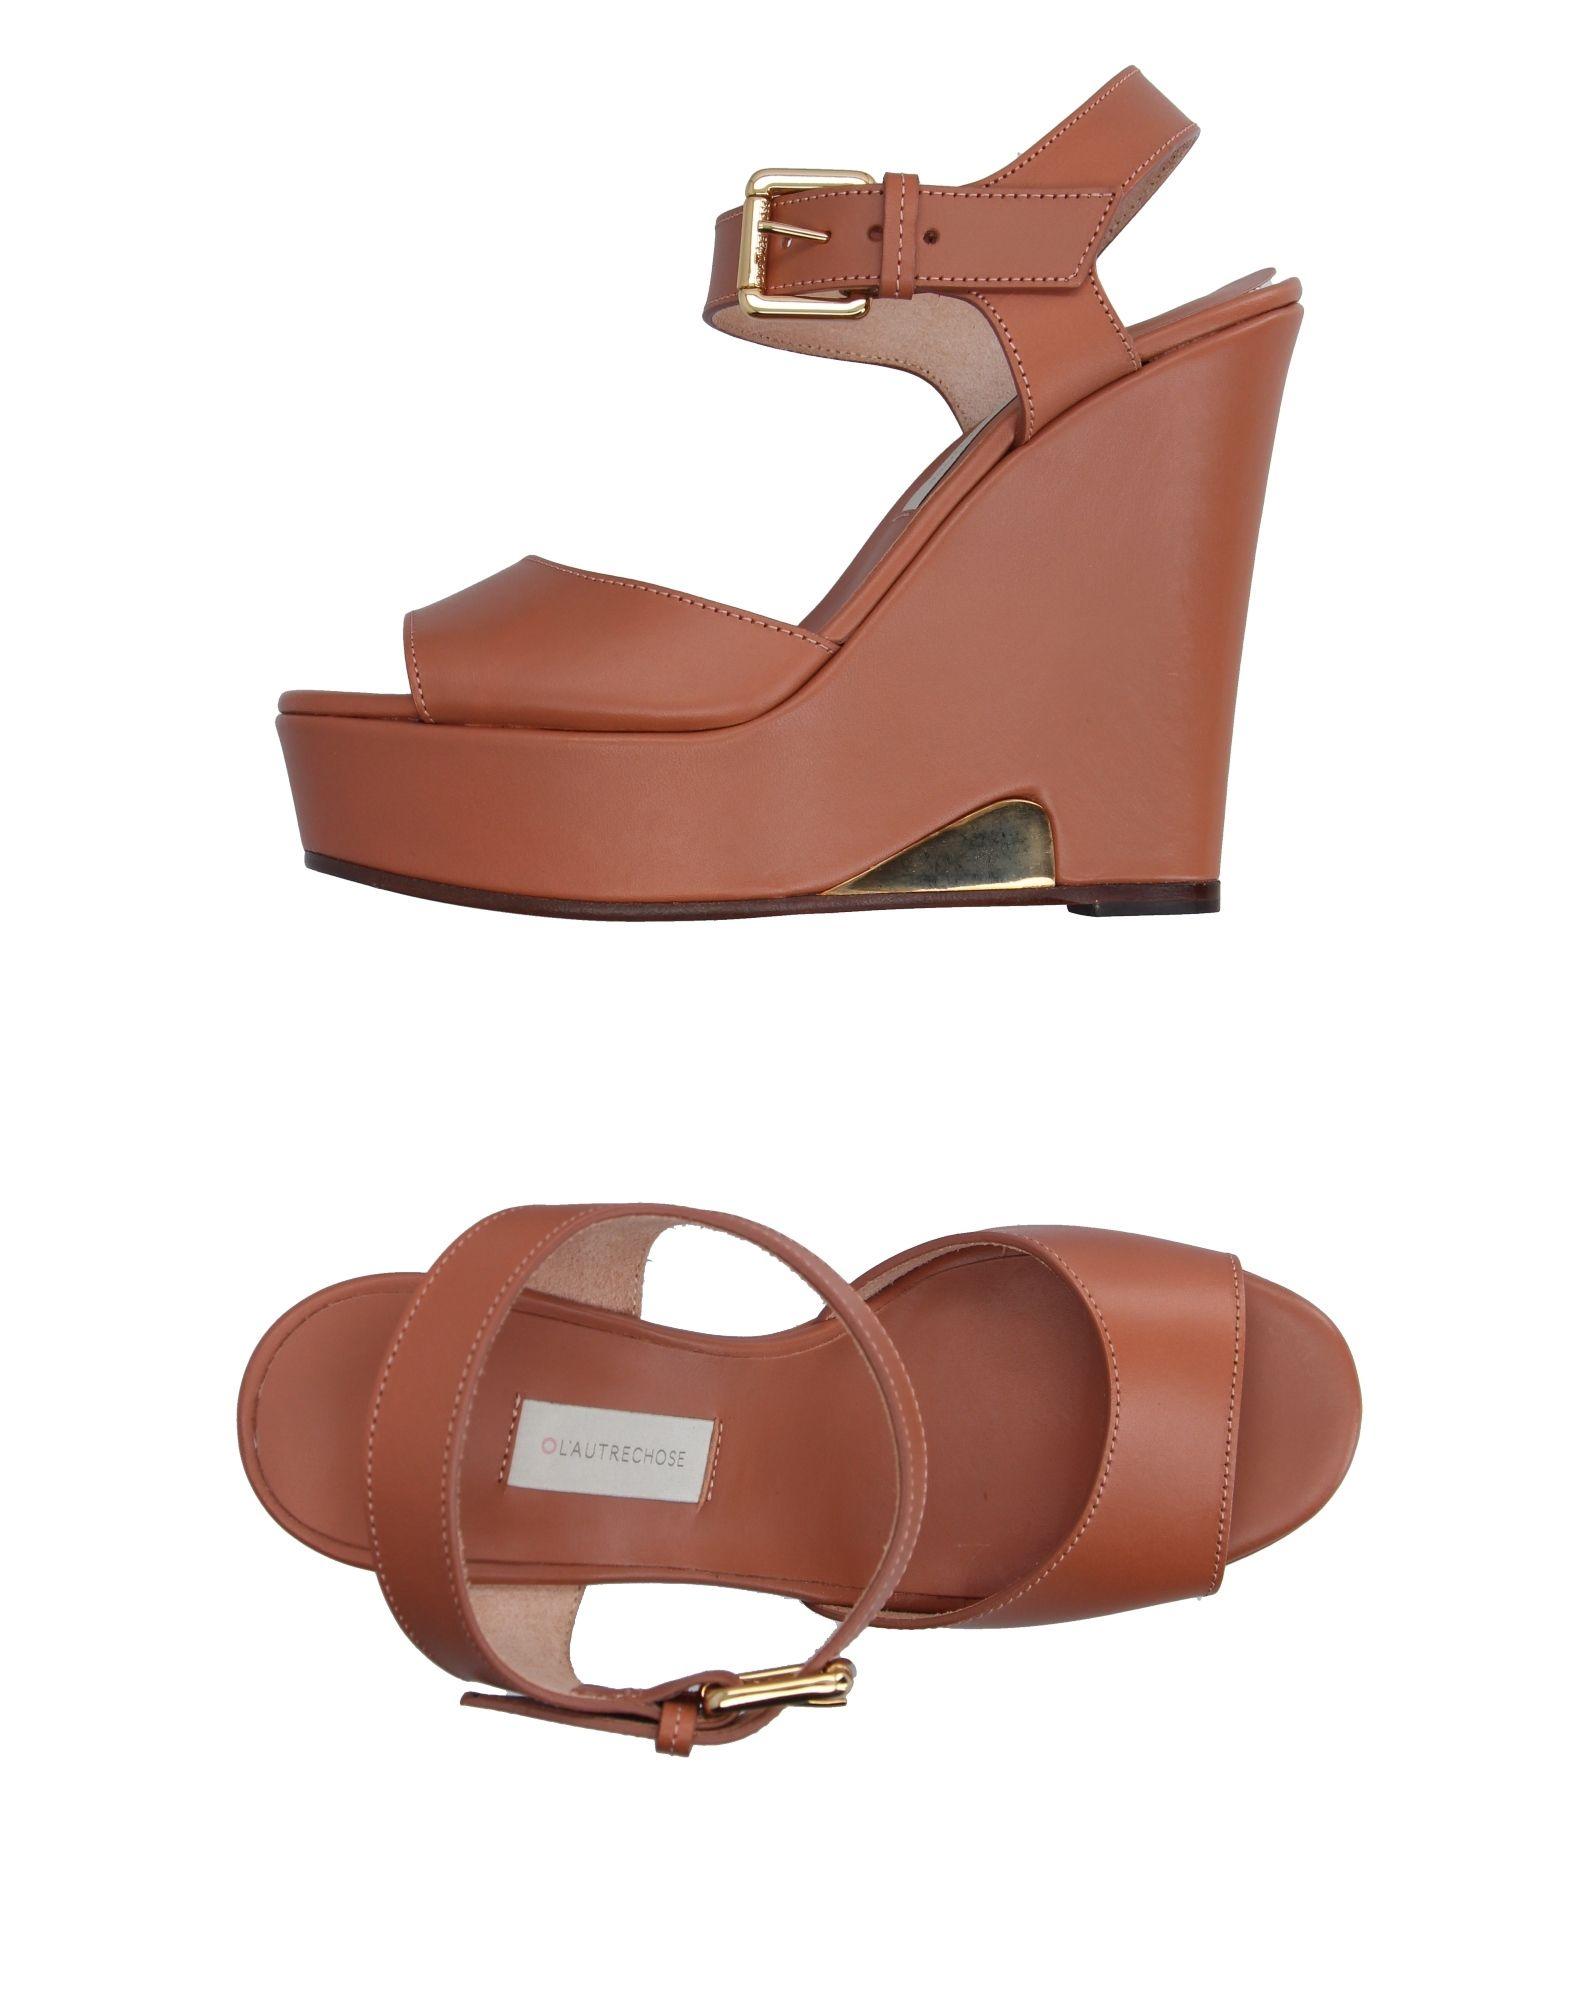 L' Autre beliebte Chose Sandalen Damen  11188976UL Gute Qualität beliebte Autre Schuhe 75ec8d